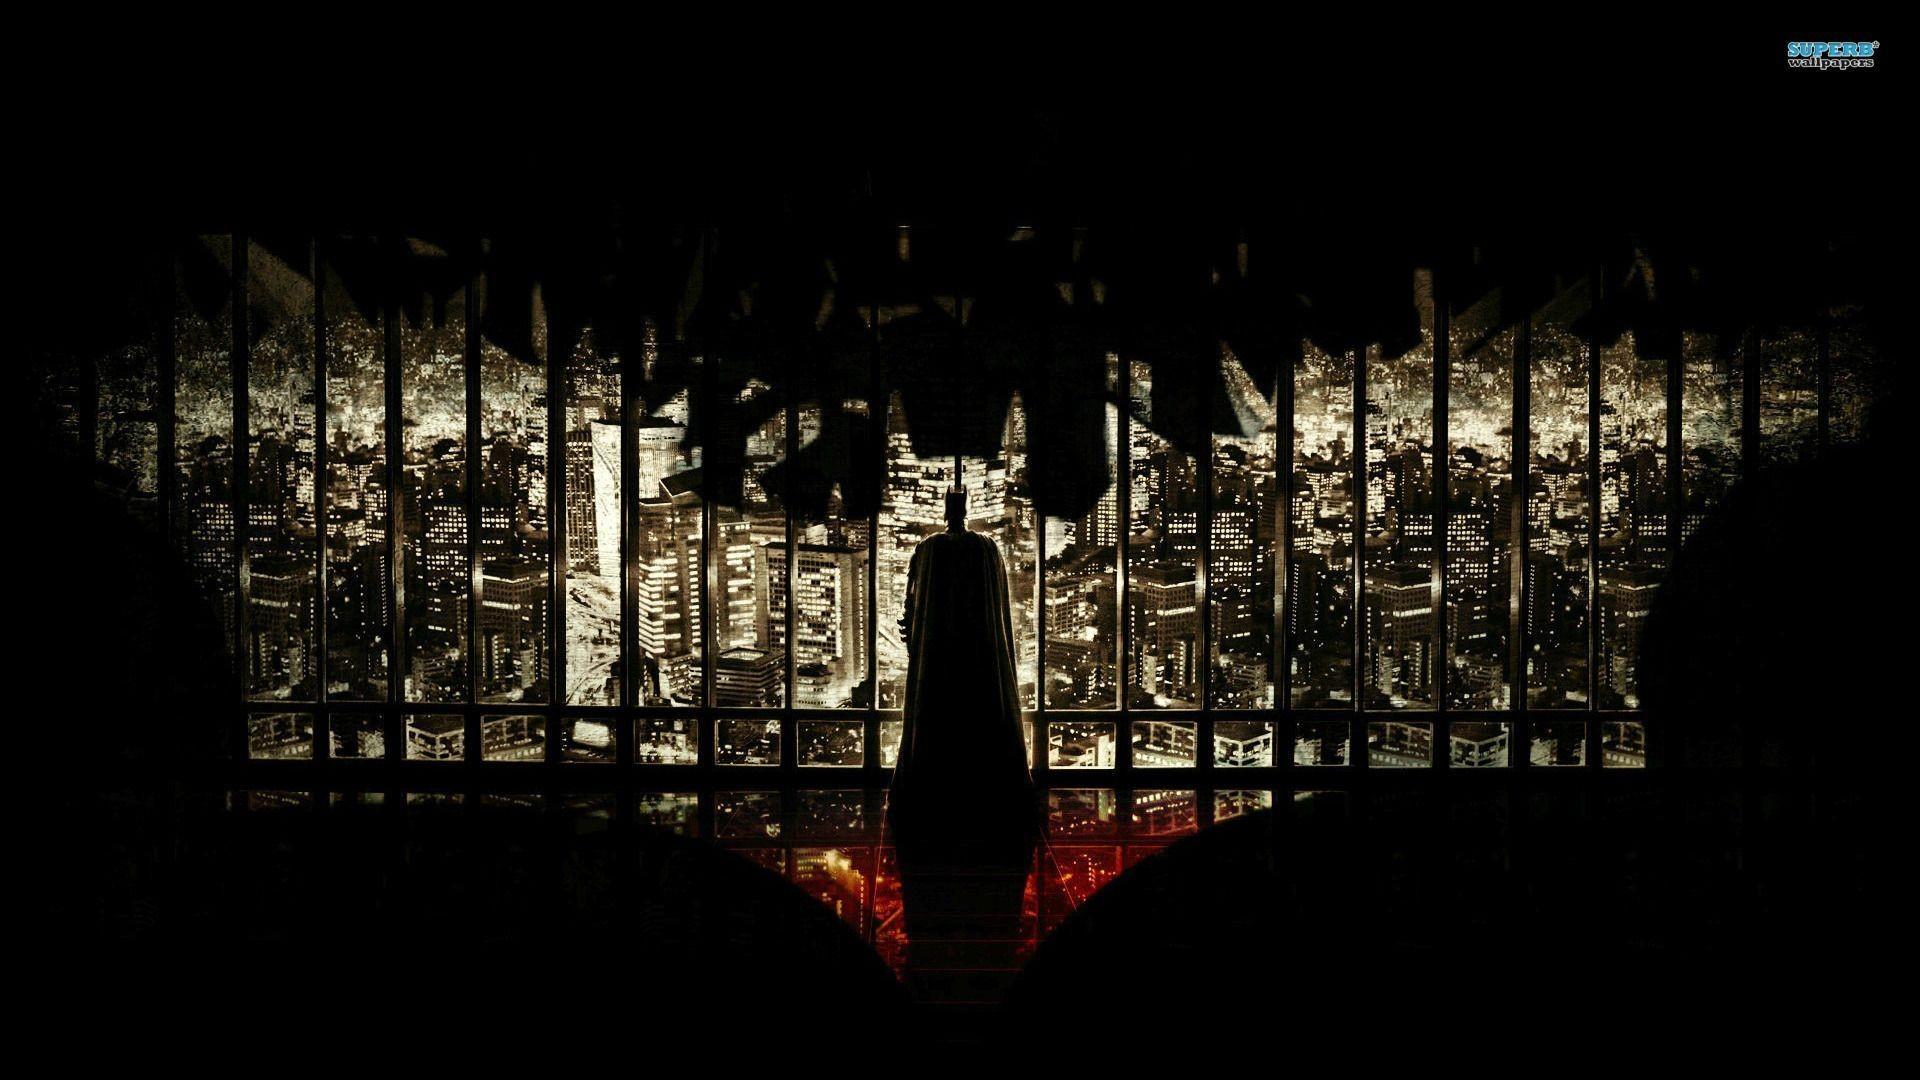 Batman – The Dark Knight Rises wallpaper – Movie wallpapers – #14639